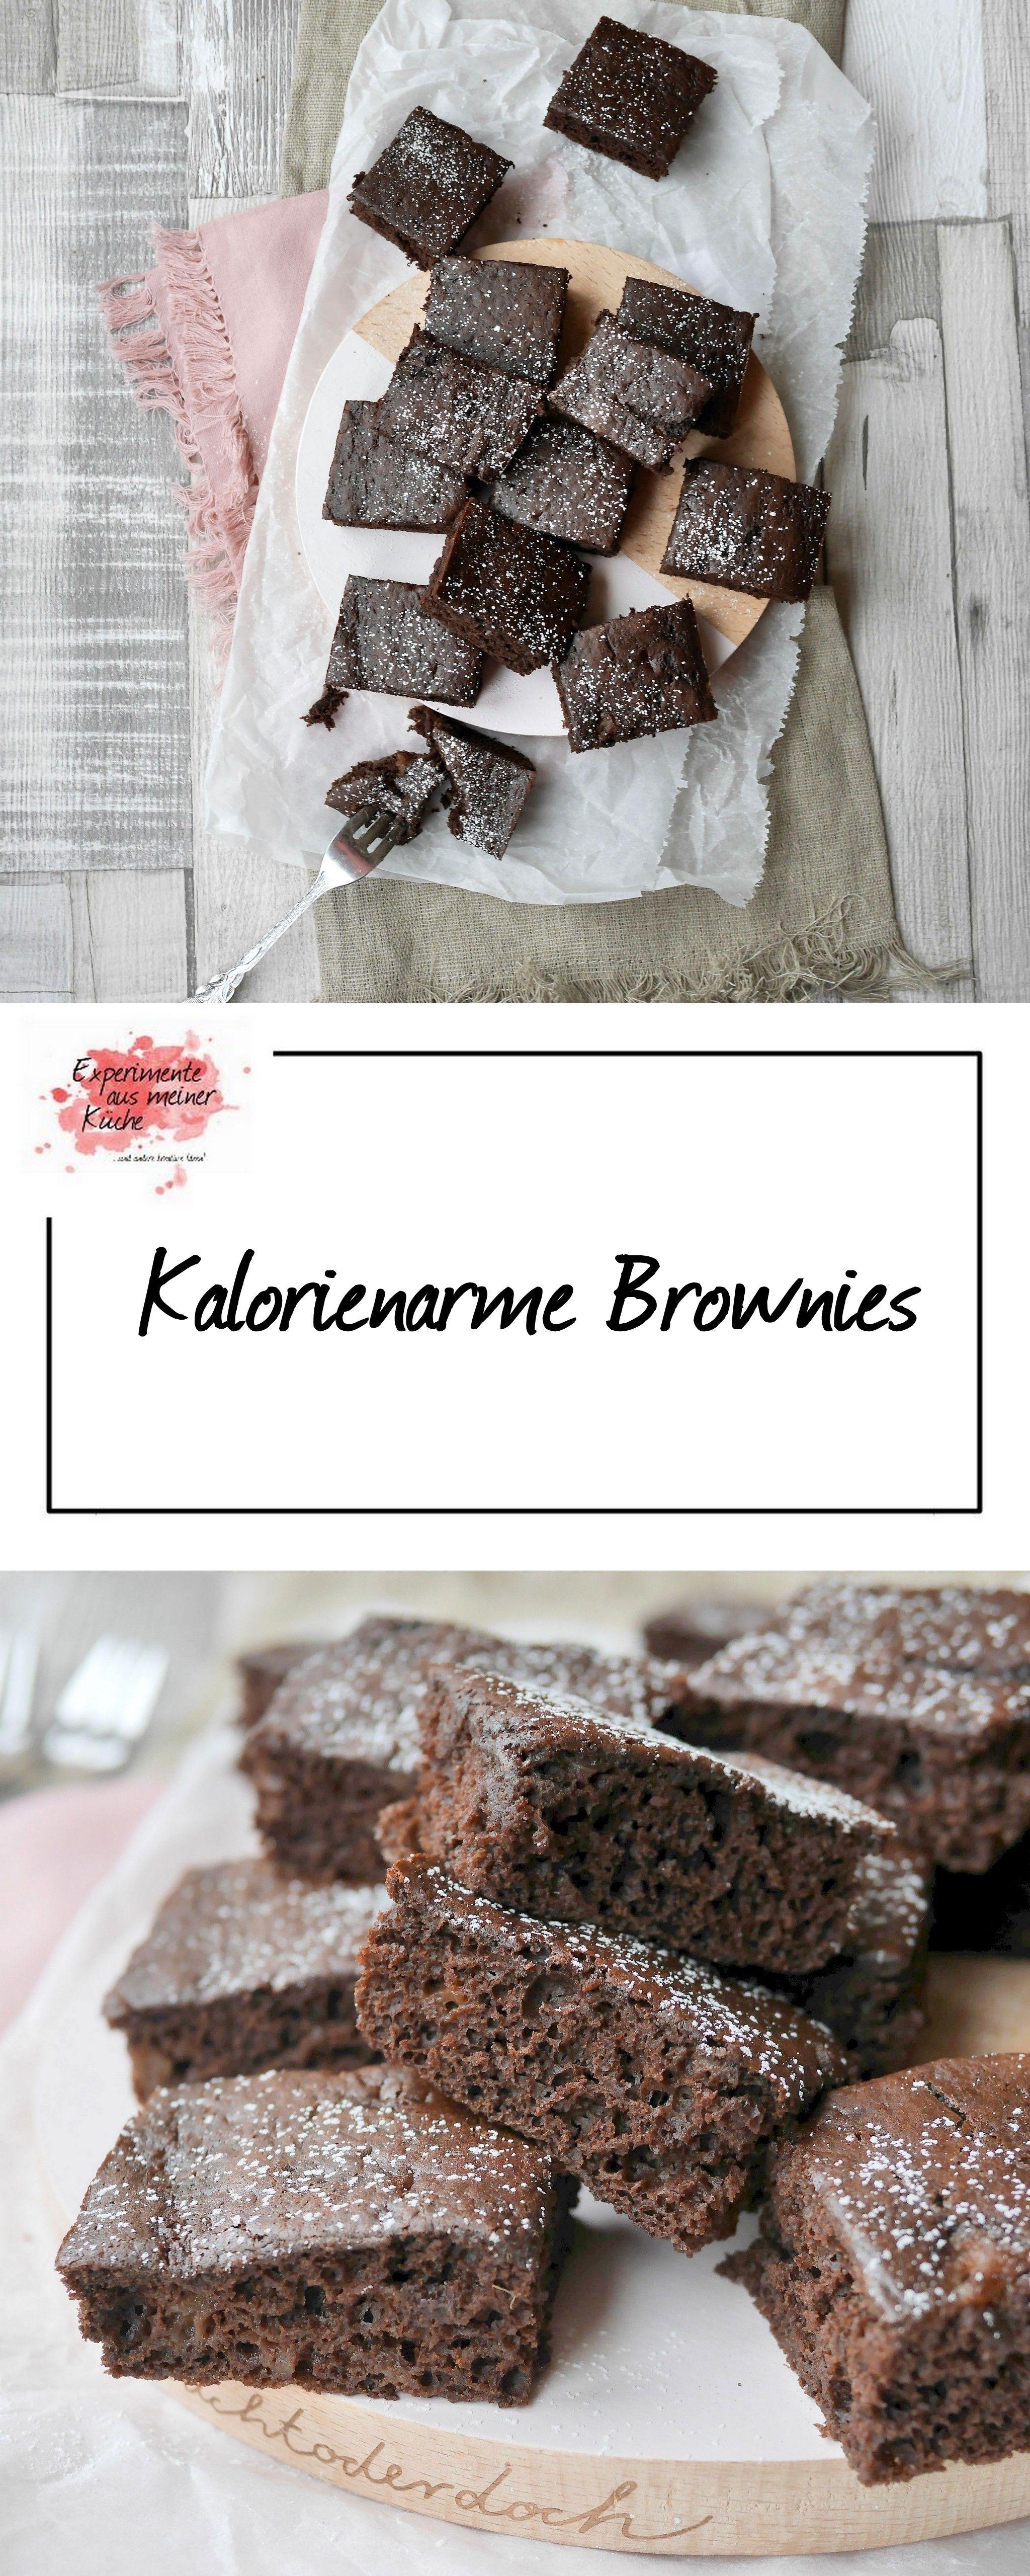 Photo of Kalorienarme Brownies – Experimente aus meiner Küche